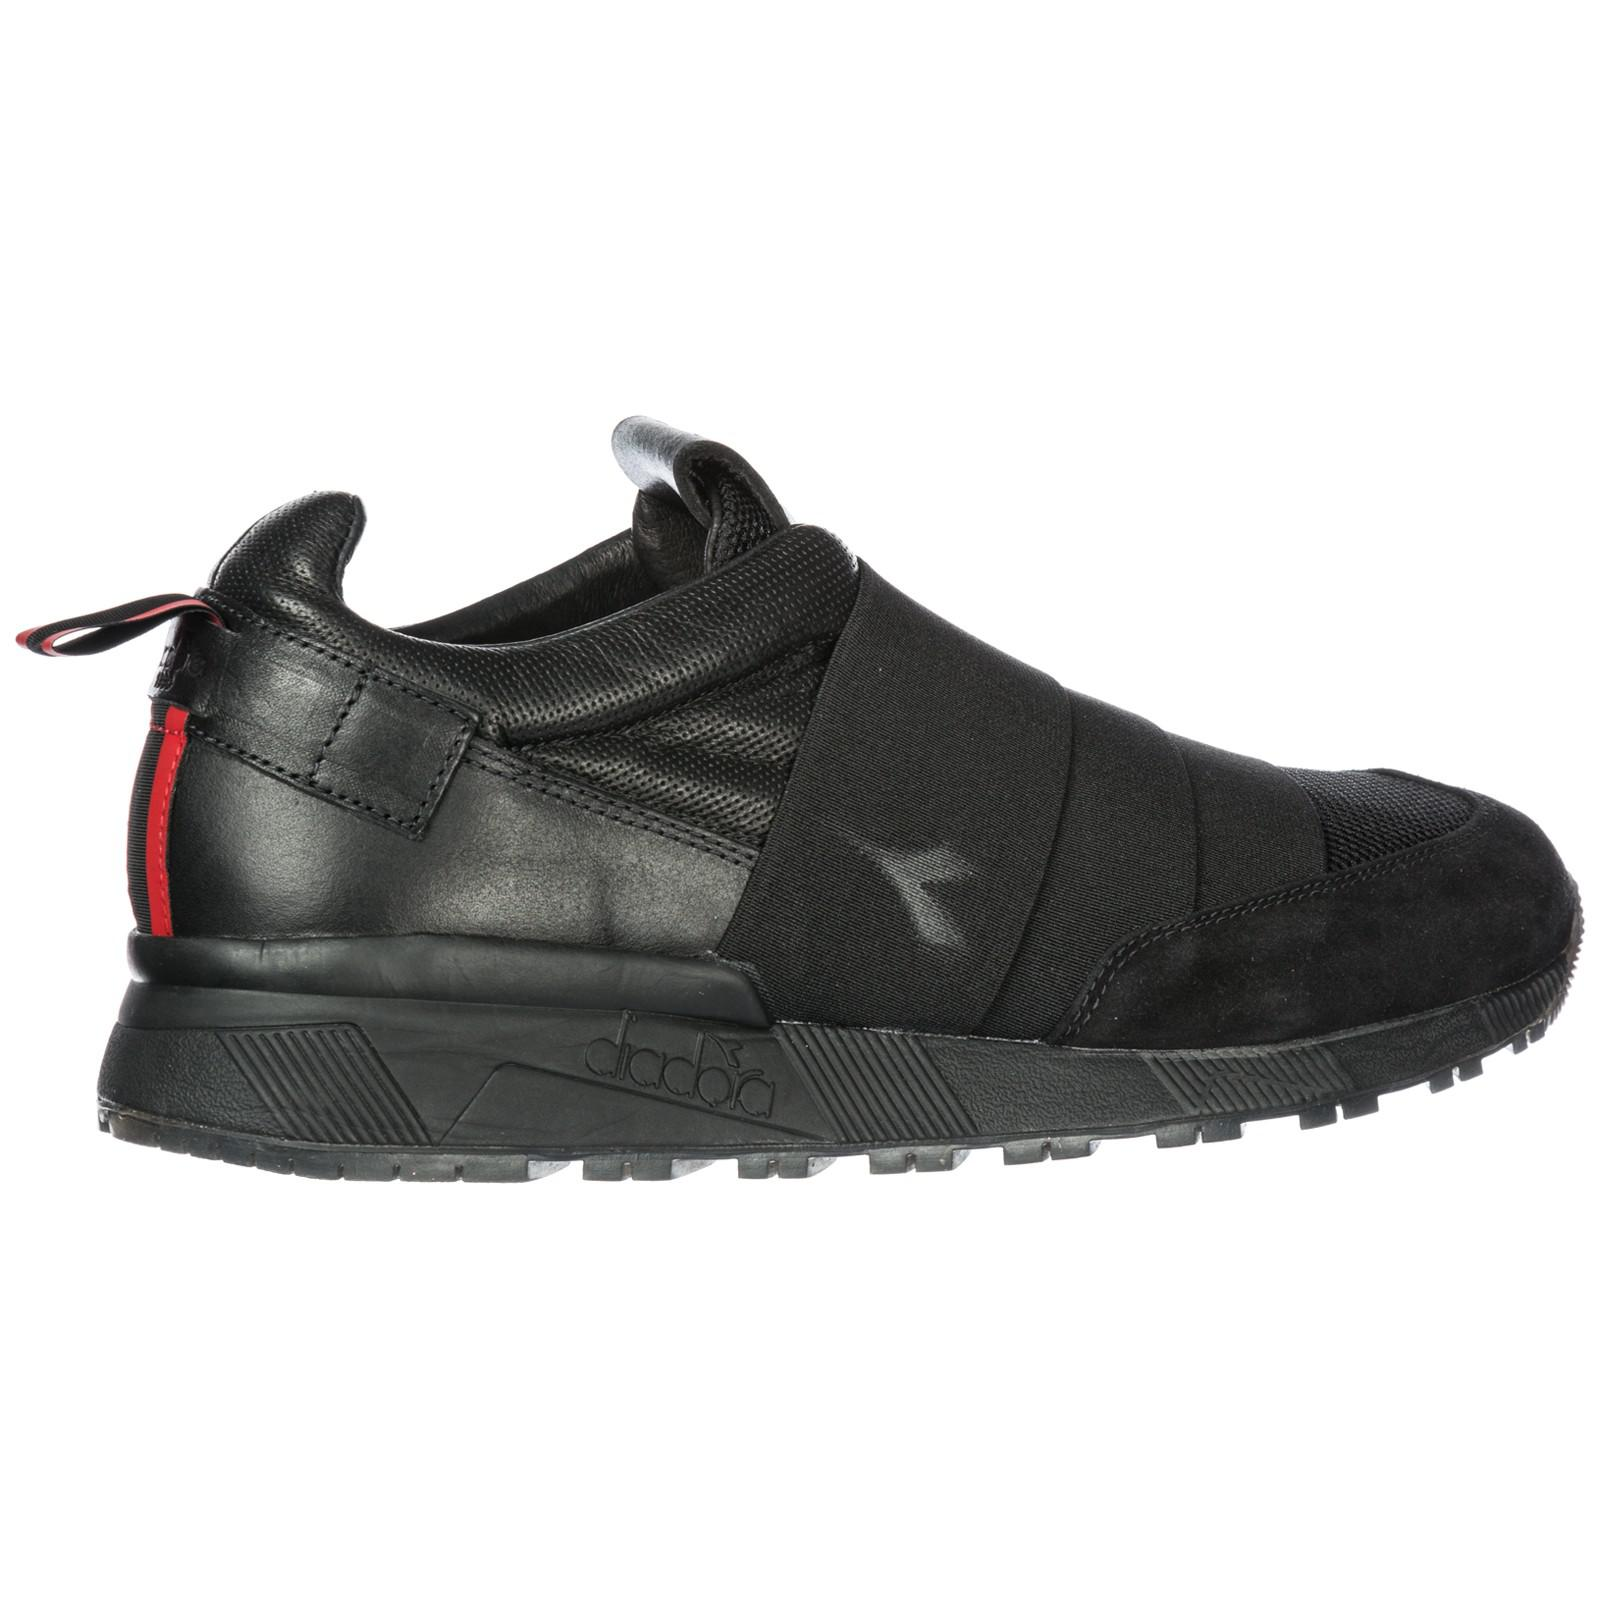 Diadora Leather Slip On Sneakers N9000